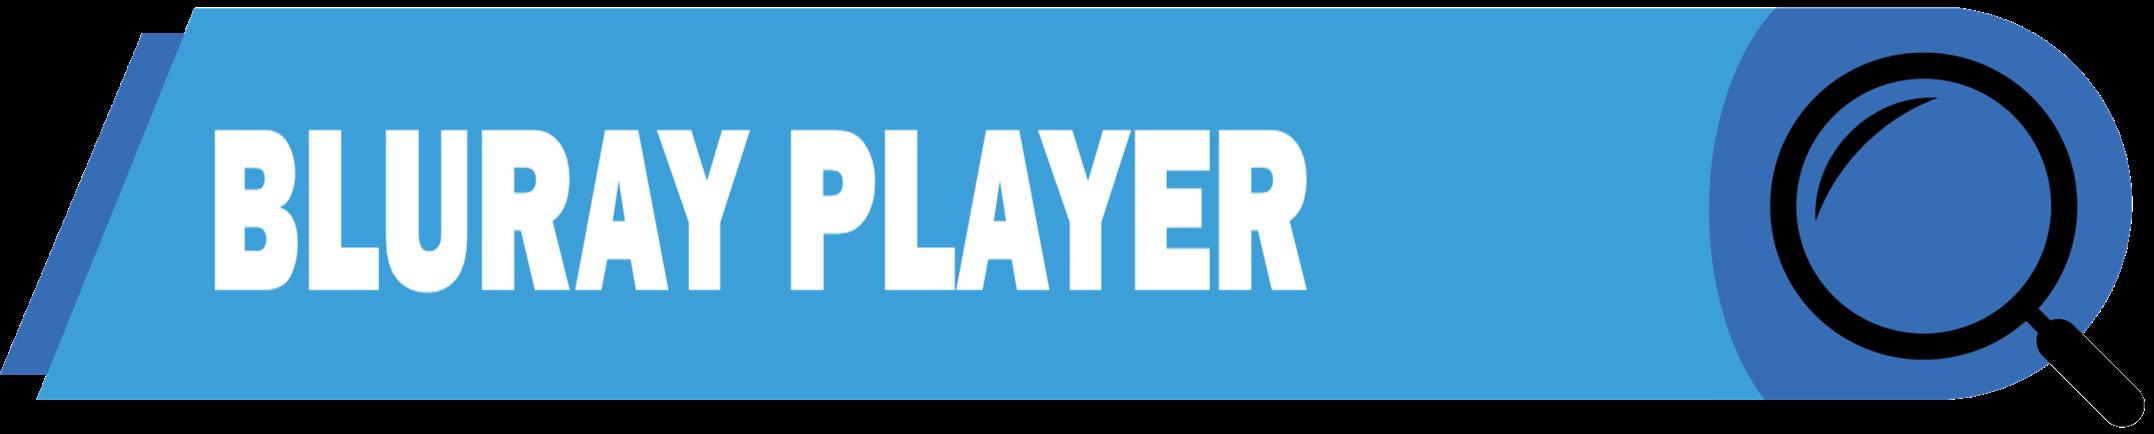 dvd-player-click-bar-a.png